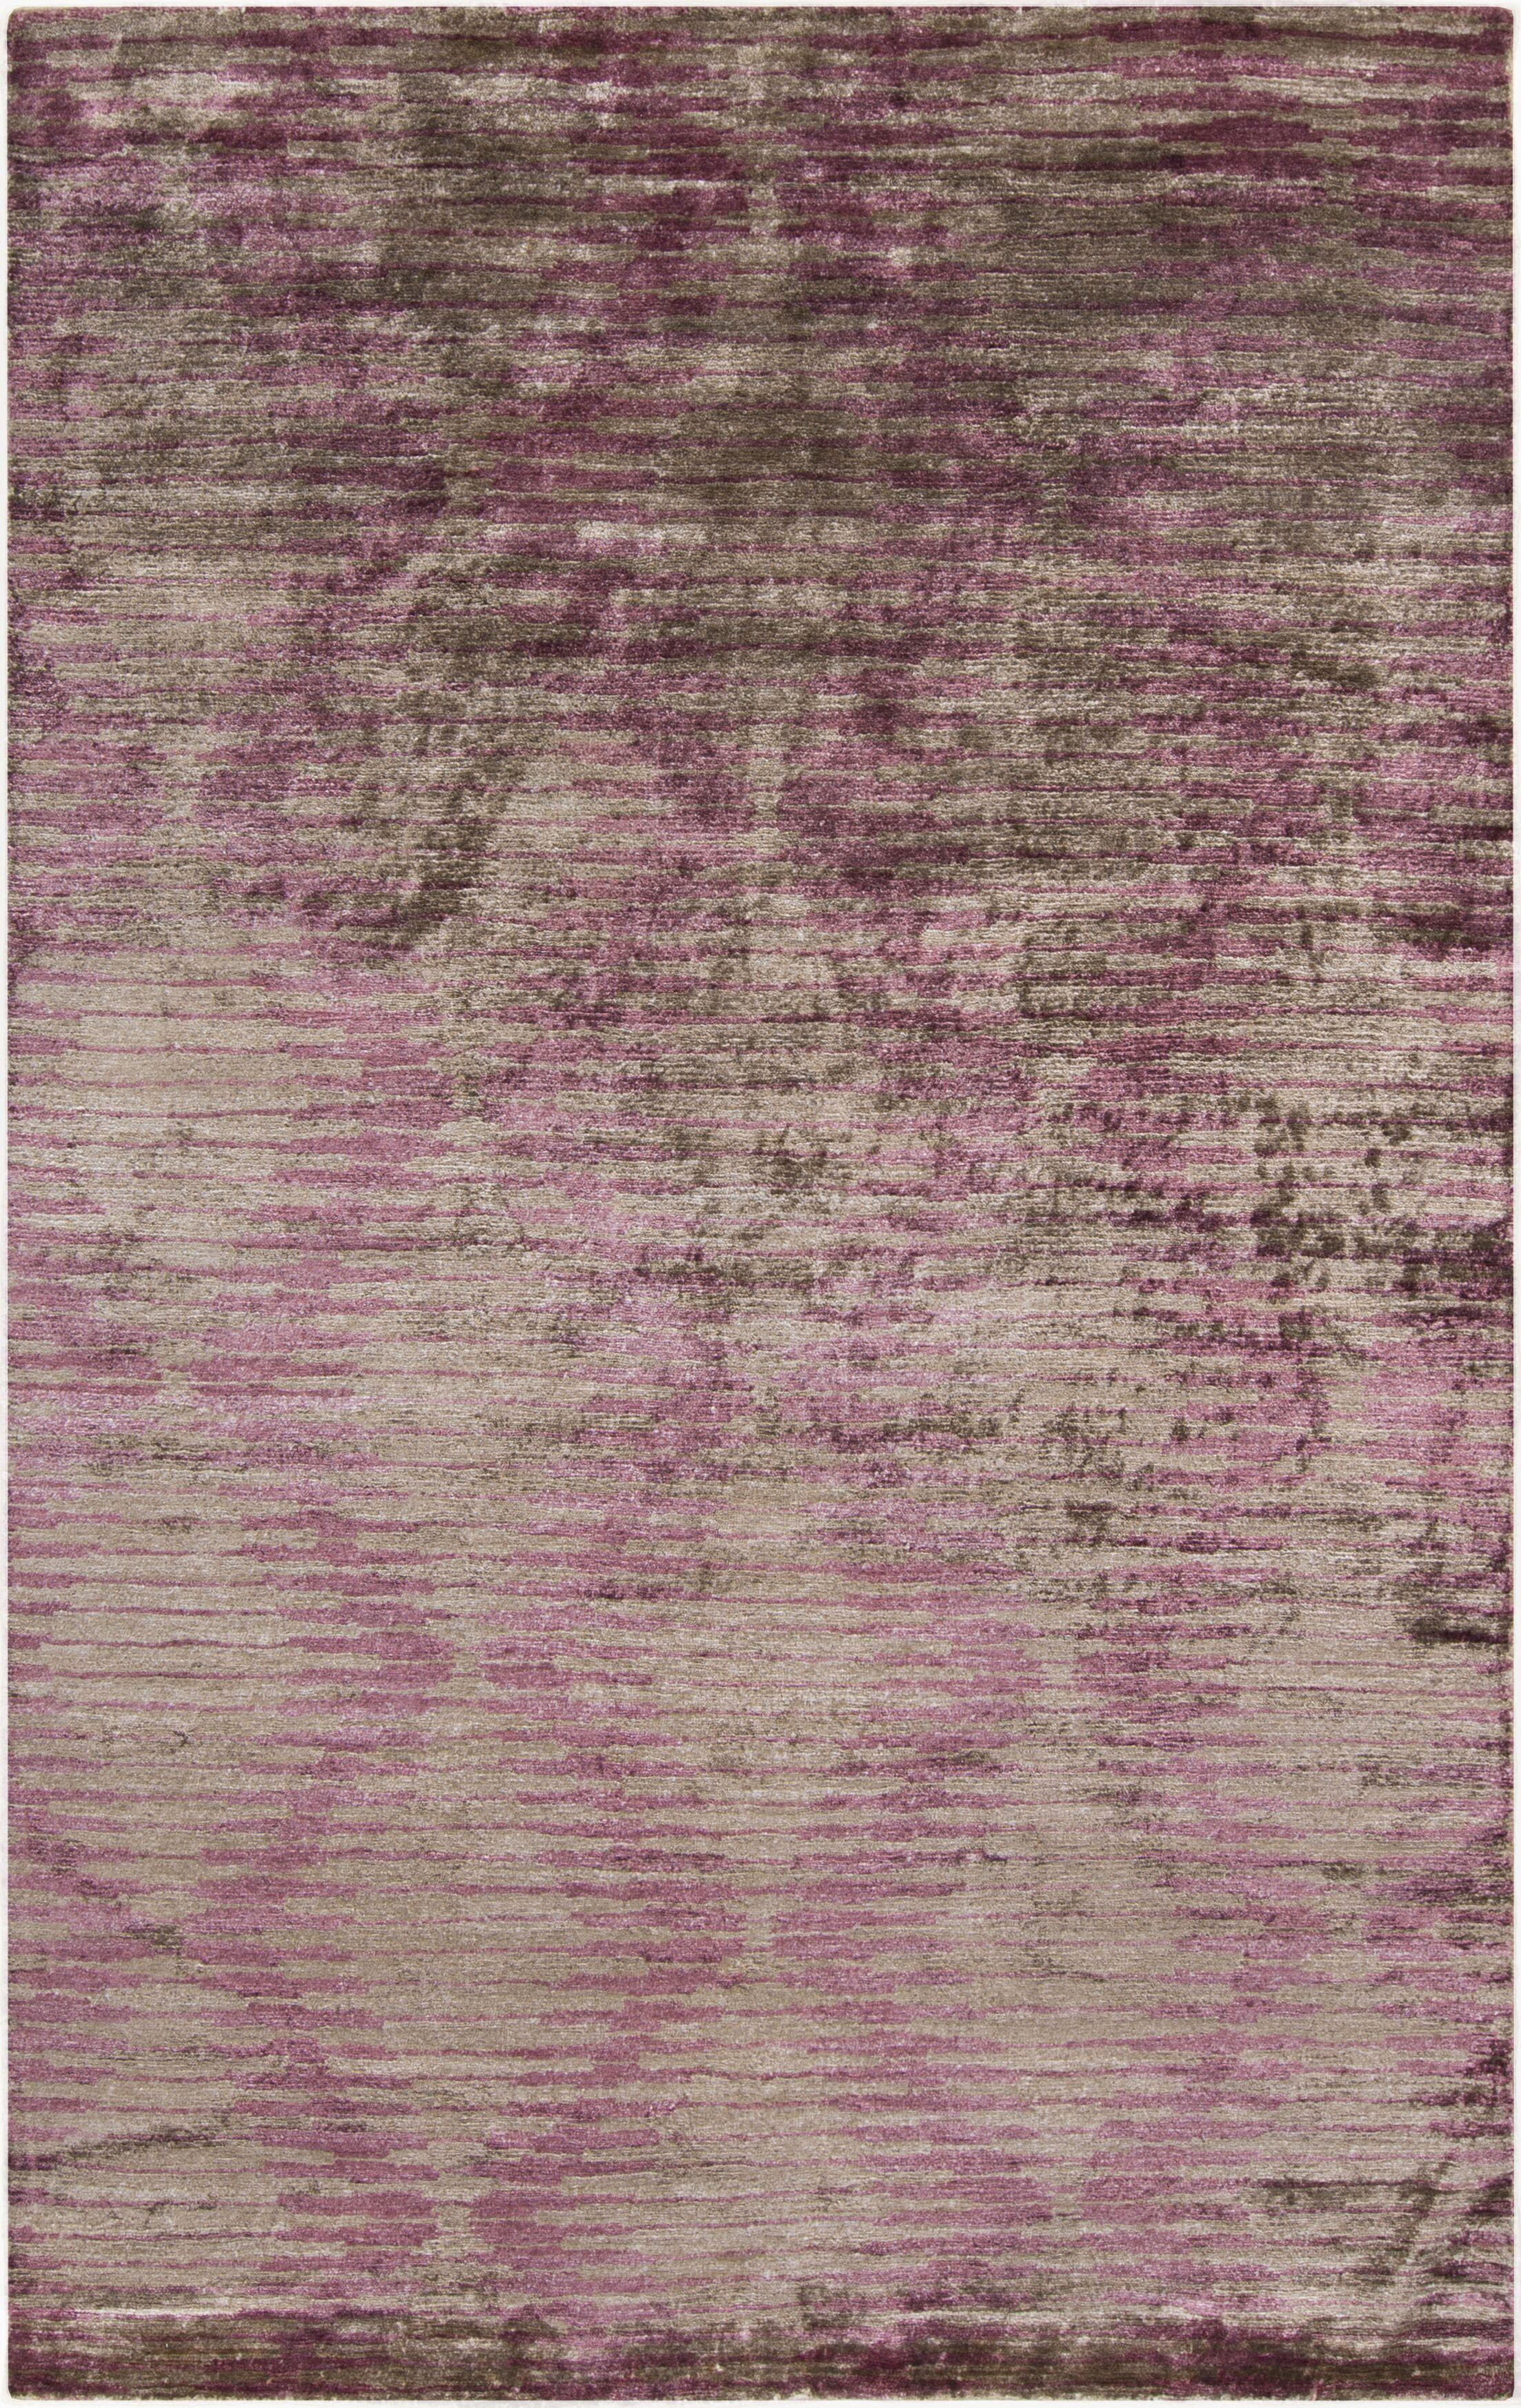 Avia Lavender Rug Rug Size: Rectangle 5' x 8'